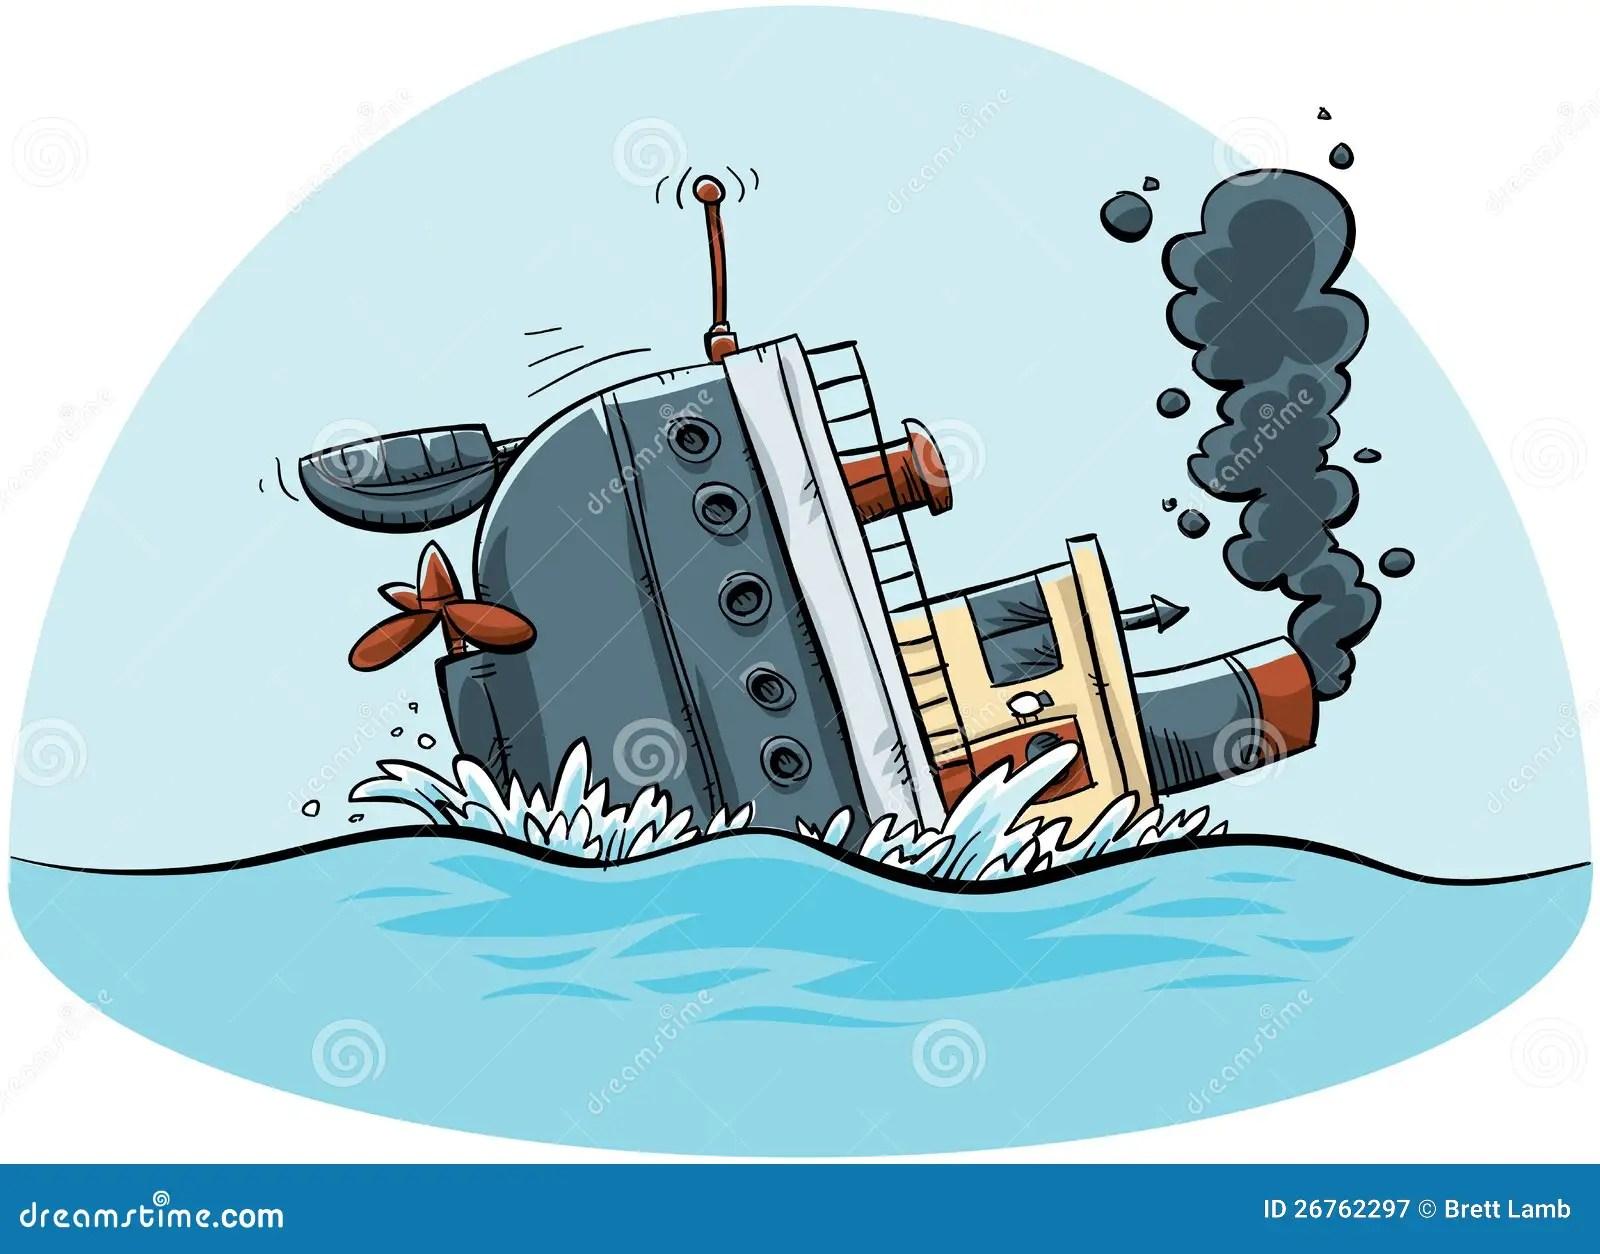 Sinking Ship Stock Illustration Illustration Of Sinking